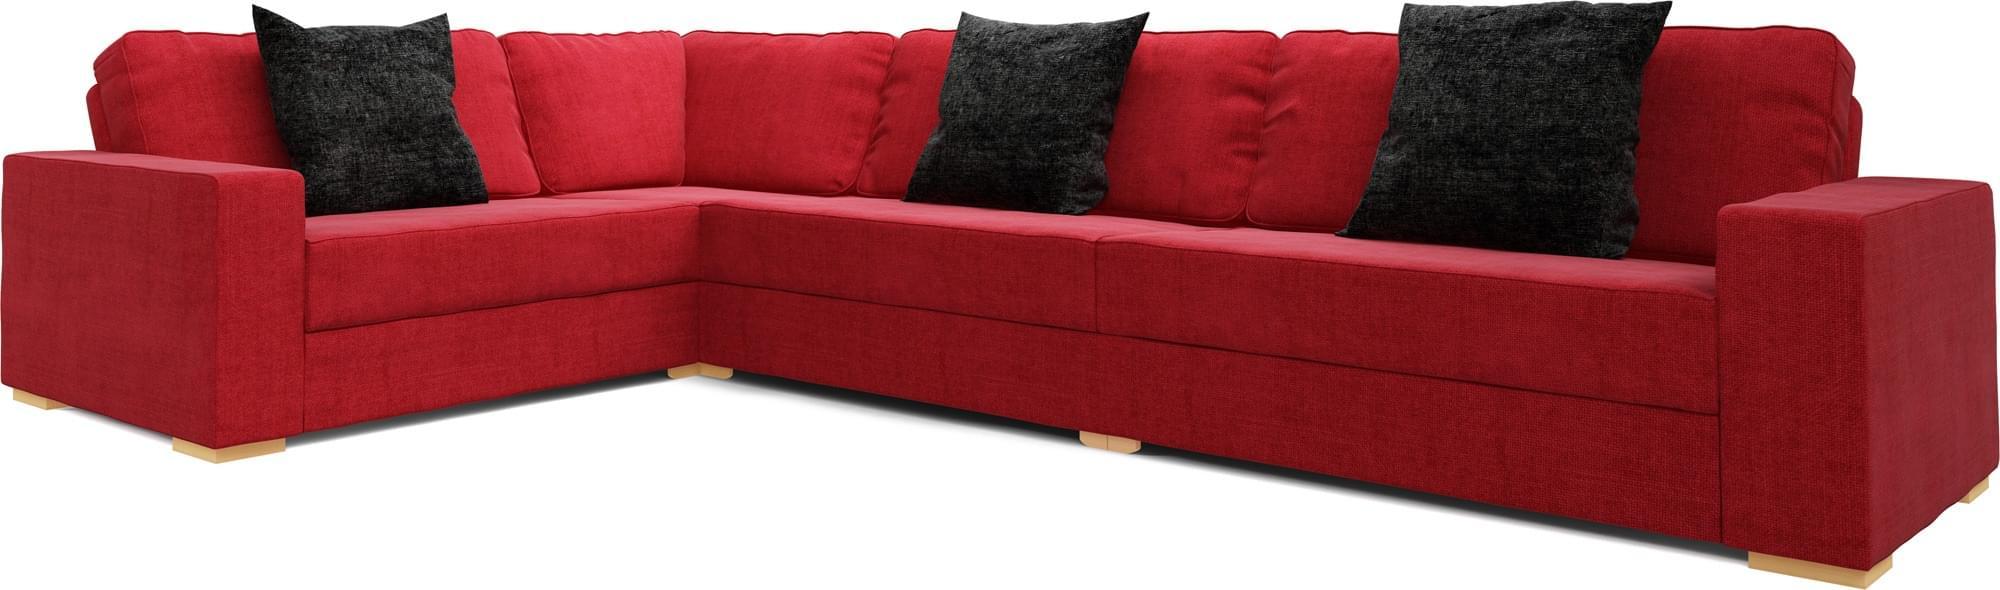 nabru corner sofa assembly instructions